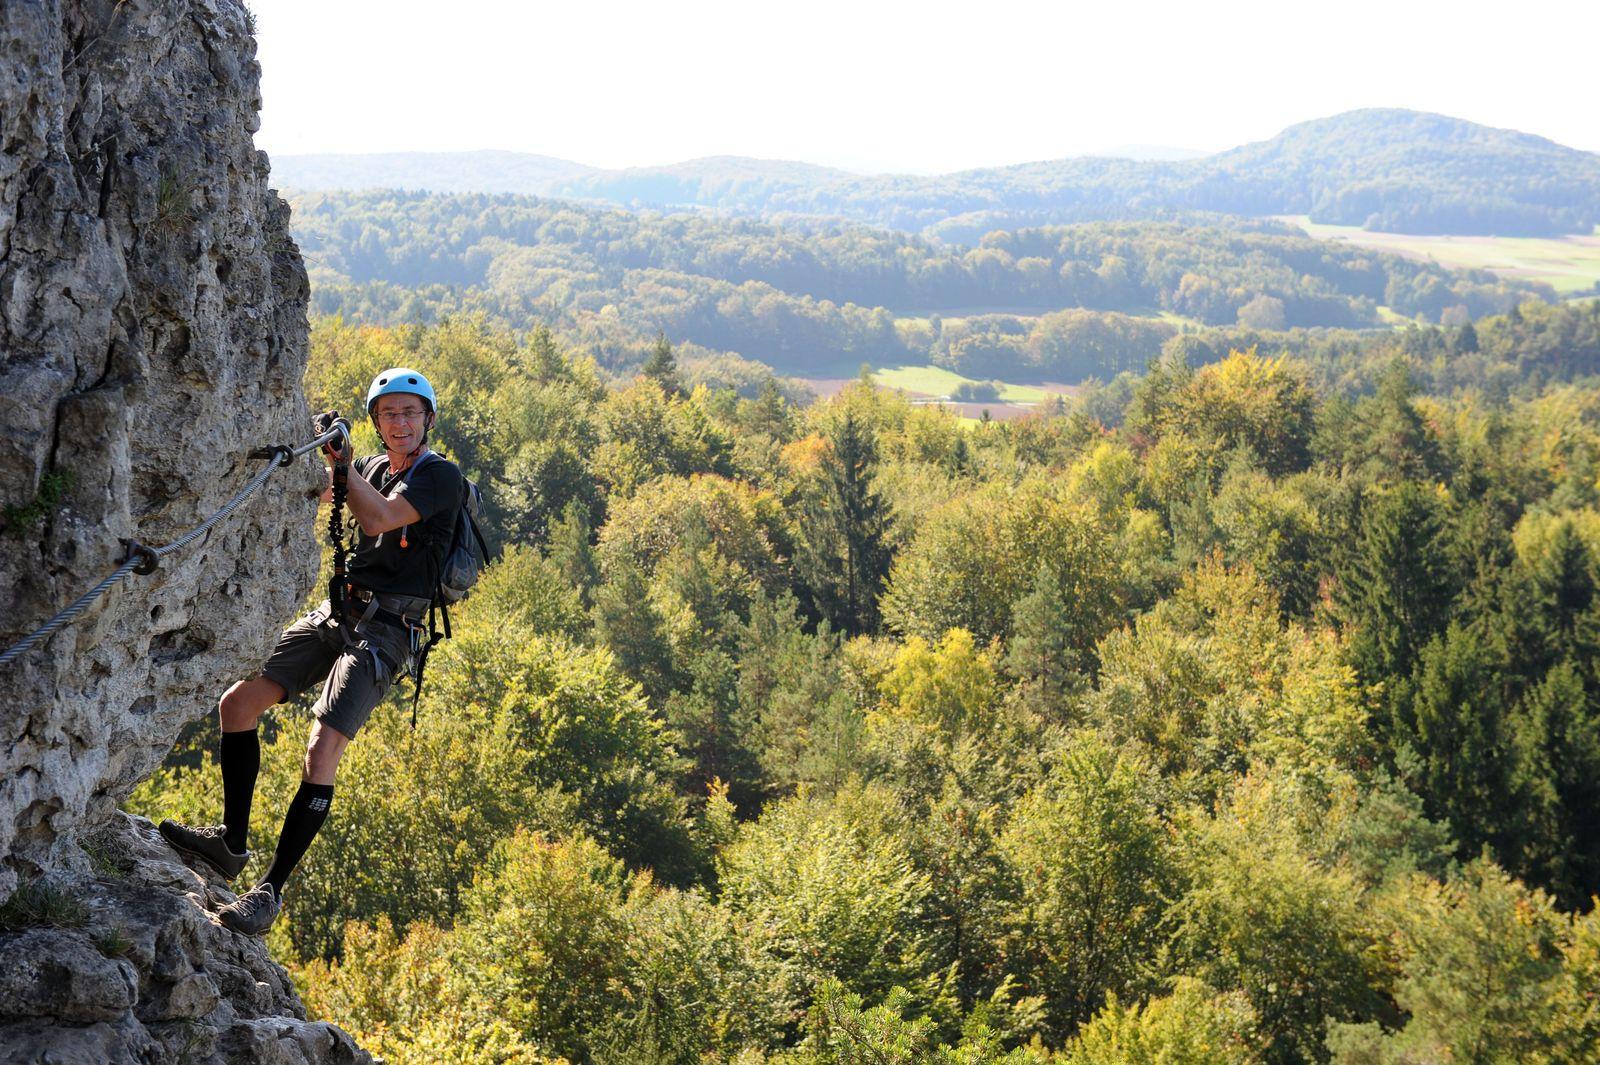 Höhenglücksteig/ Klettersteig